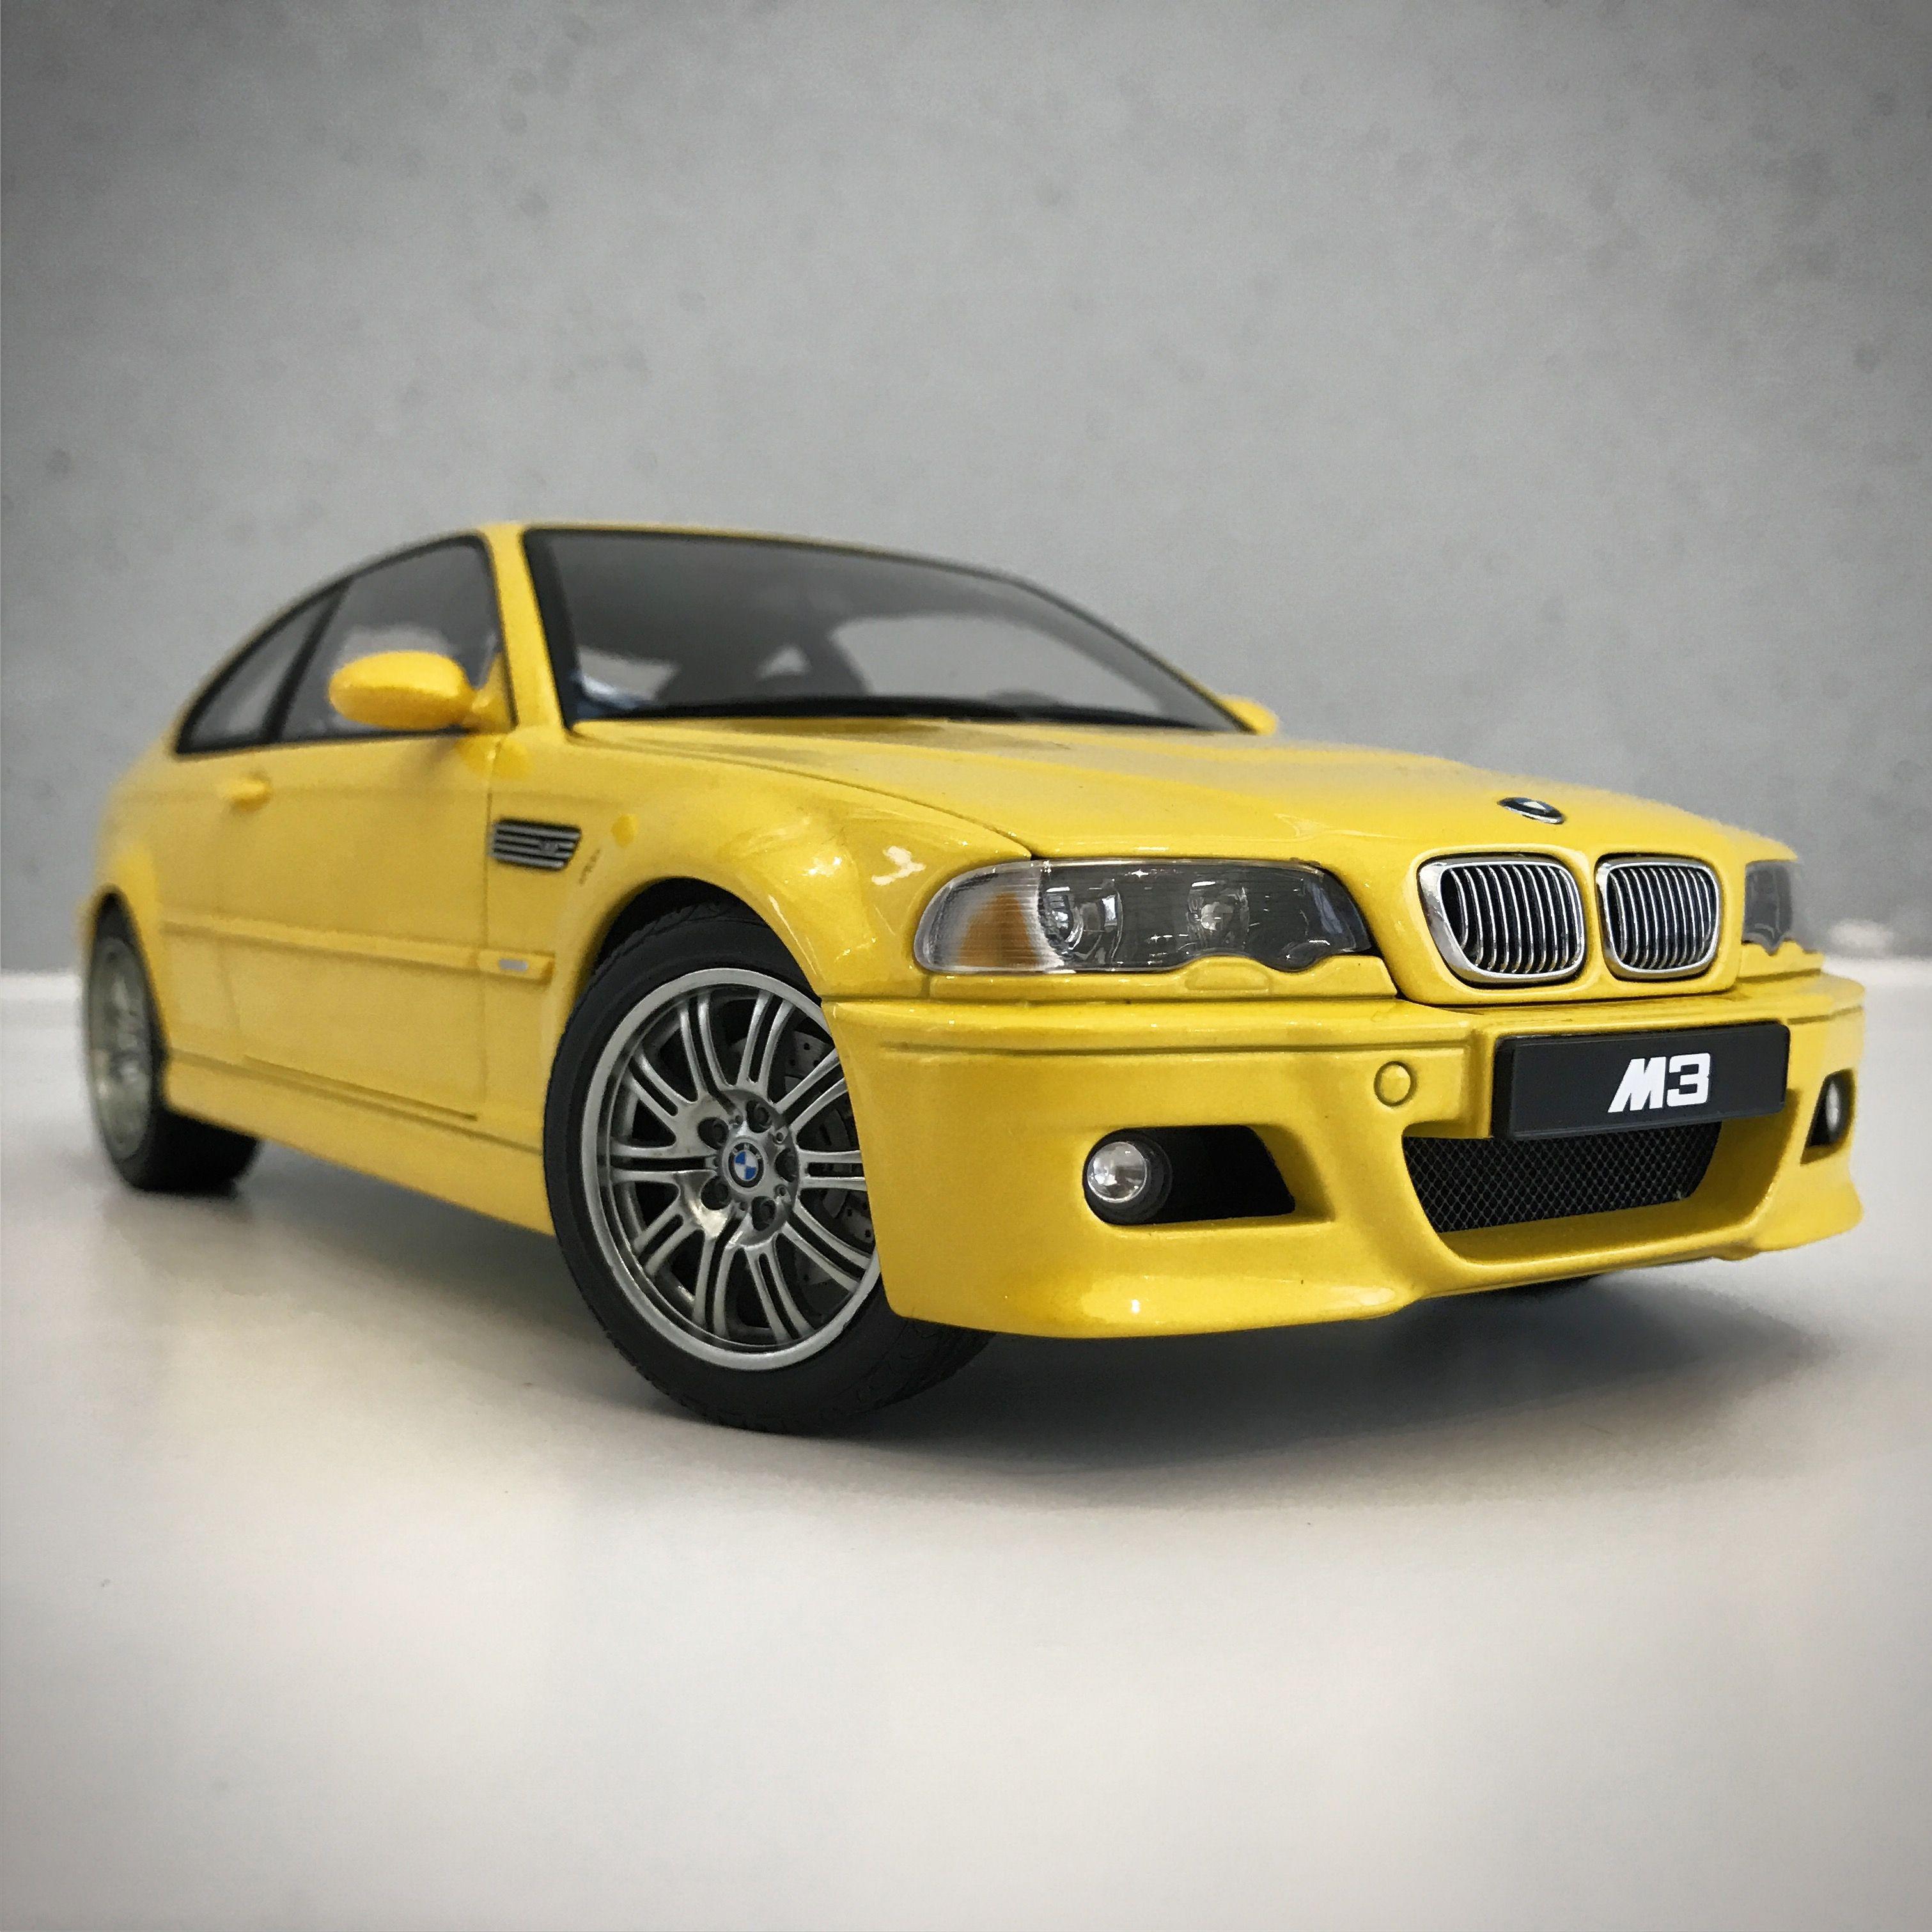 Bmw Z3 Yellow: 1/18 BMW Diecast Collection